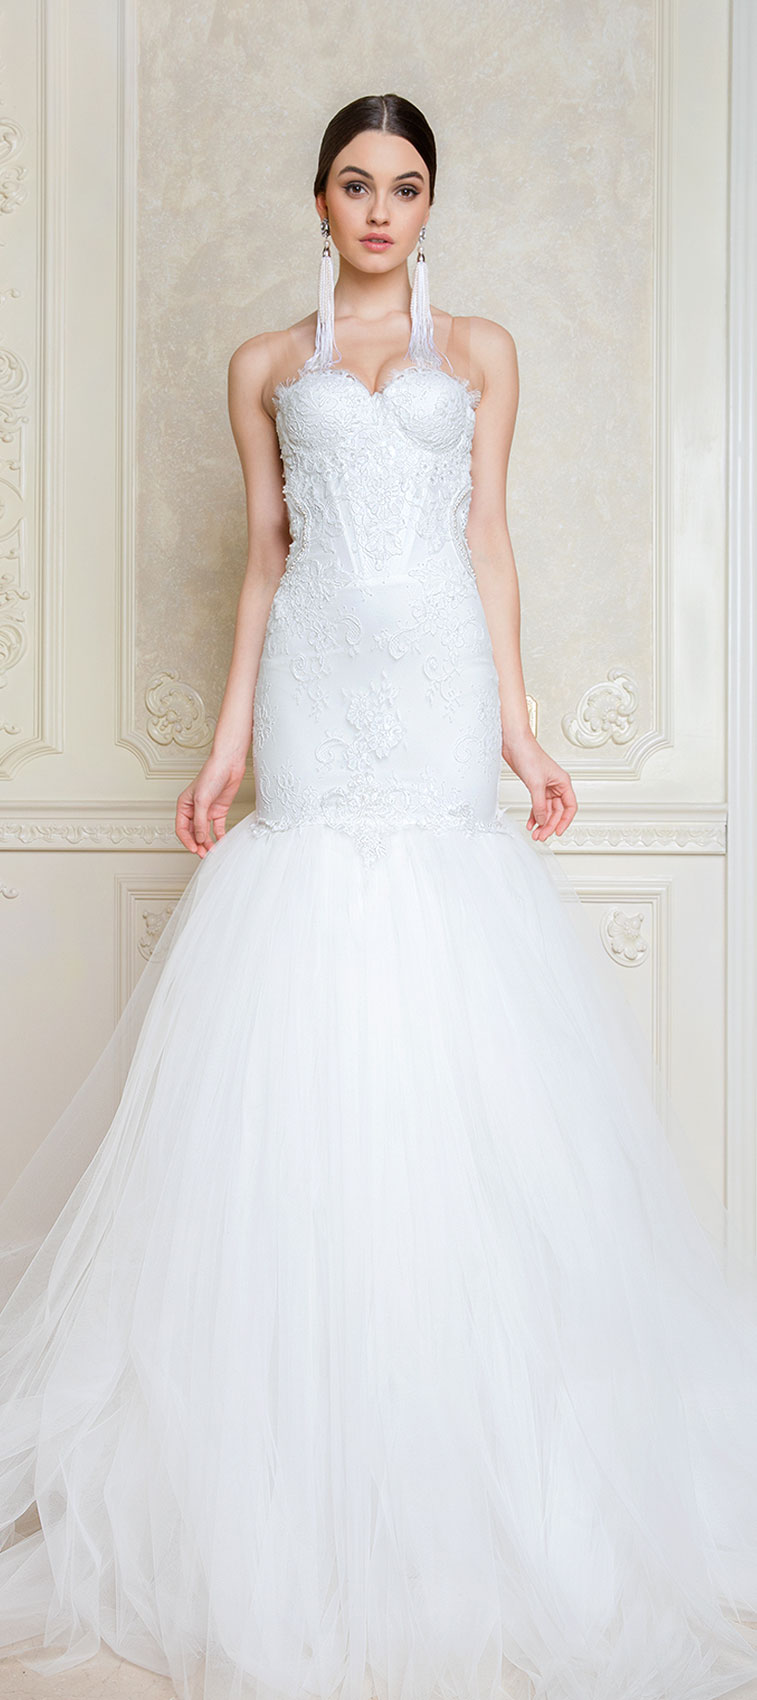 Sheer illusion tulle low back layered tulle trumpet wedding dress : Musat - Midsummer Dream Bridal Collection #weddingdress #weddinggown #weddingdresses #bridedress